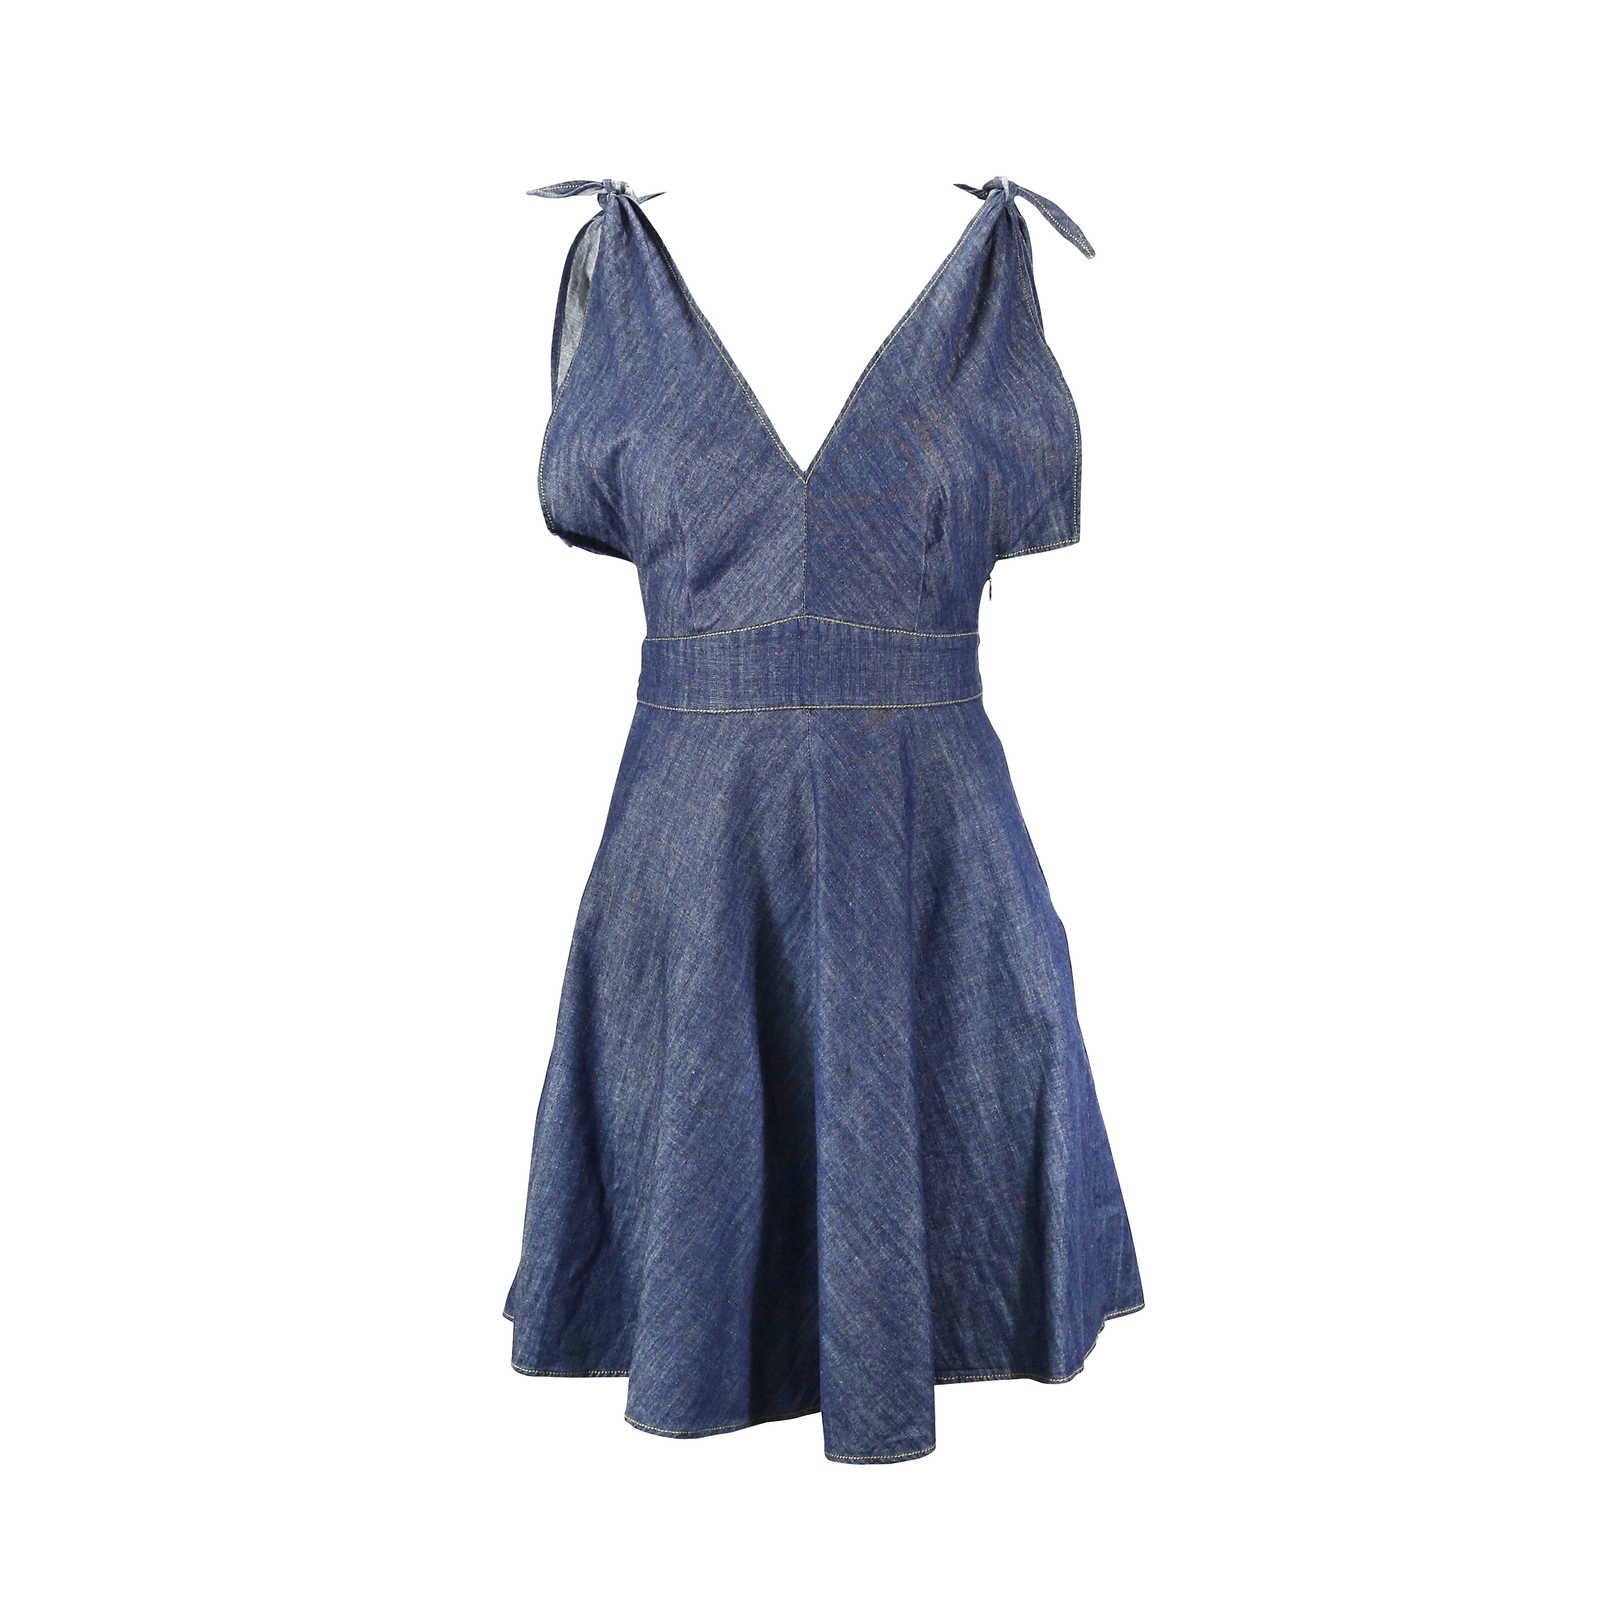 Authentic Pre Owned Derek Lam Denim Dress Pss 147 00009 Thumbnail